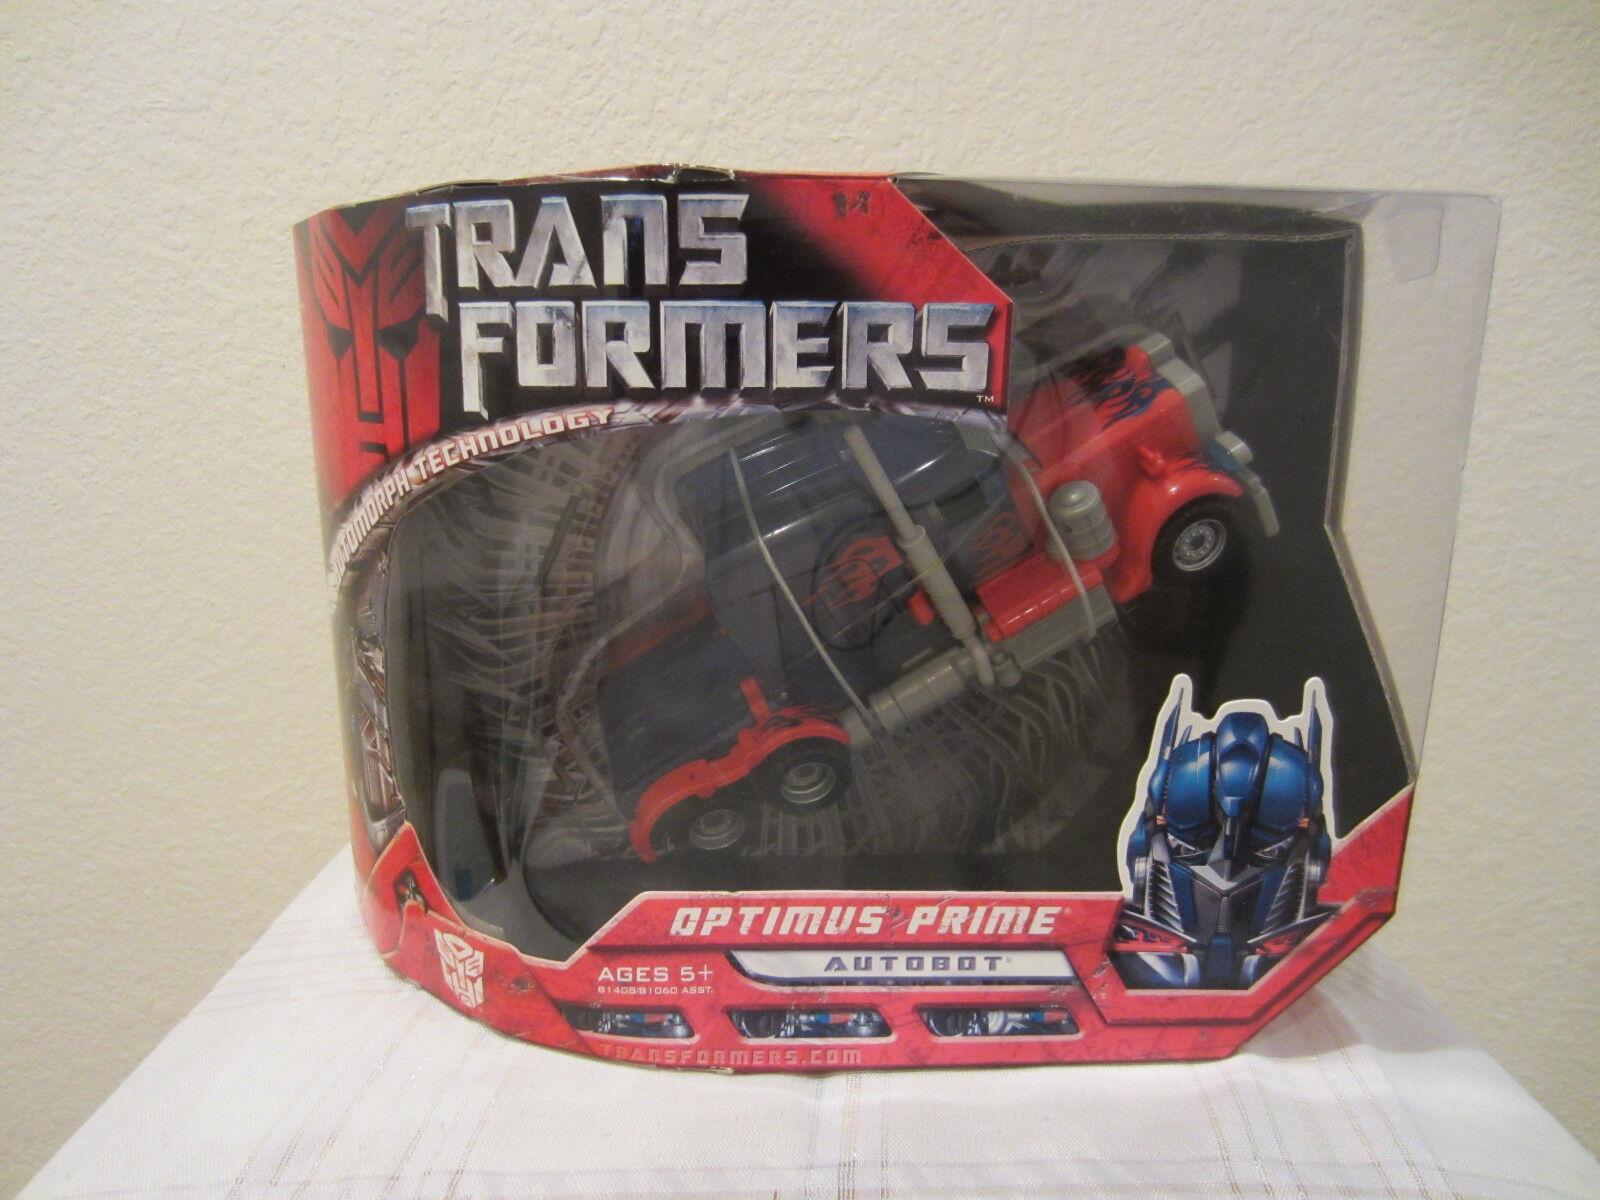 Transformers Hasbro 2007 Movie Voyager Class Autobot Optimus Prime MISB new